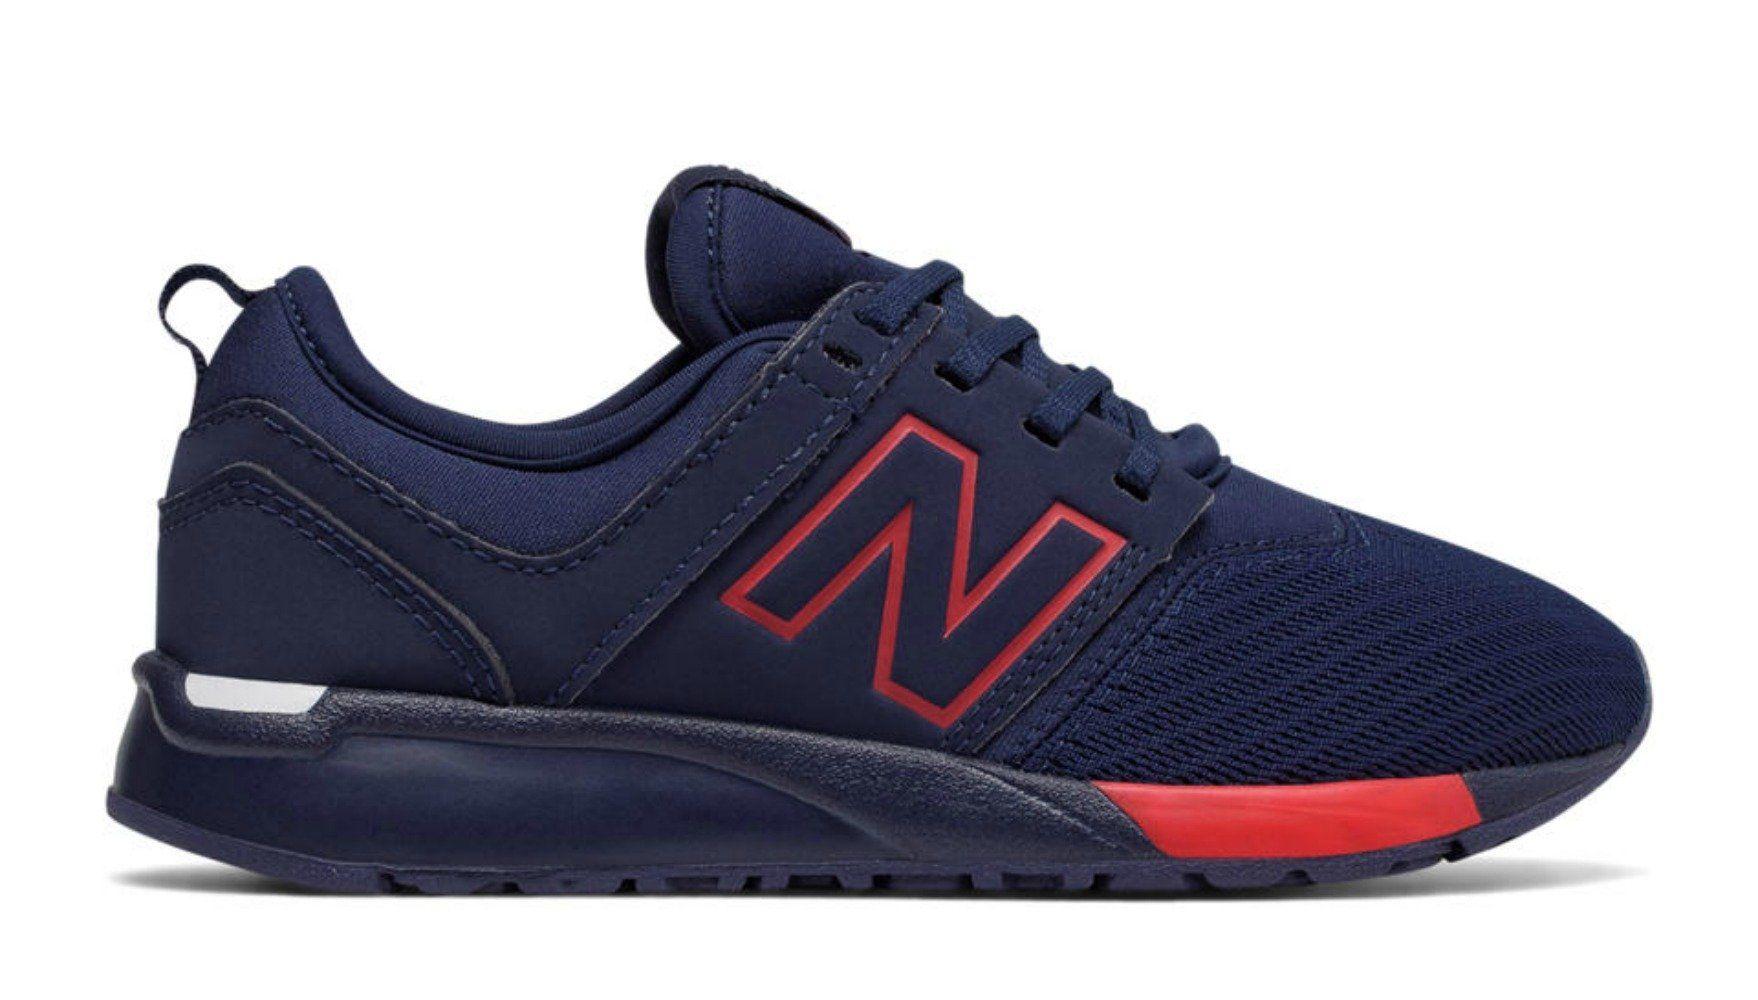 NEW BALANCE 247 Sneaker Kids | Navy / Red (KL247NR) | Kids ...